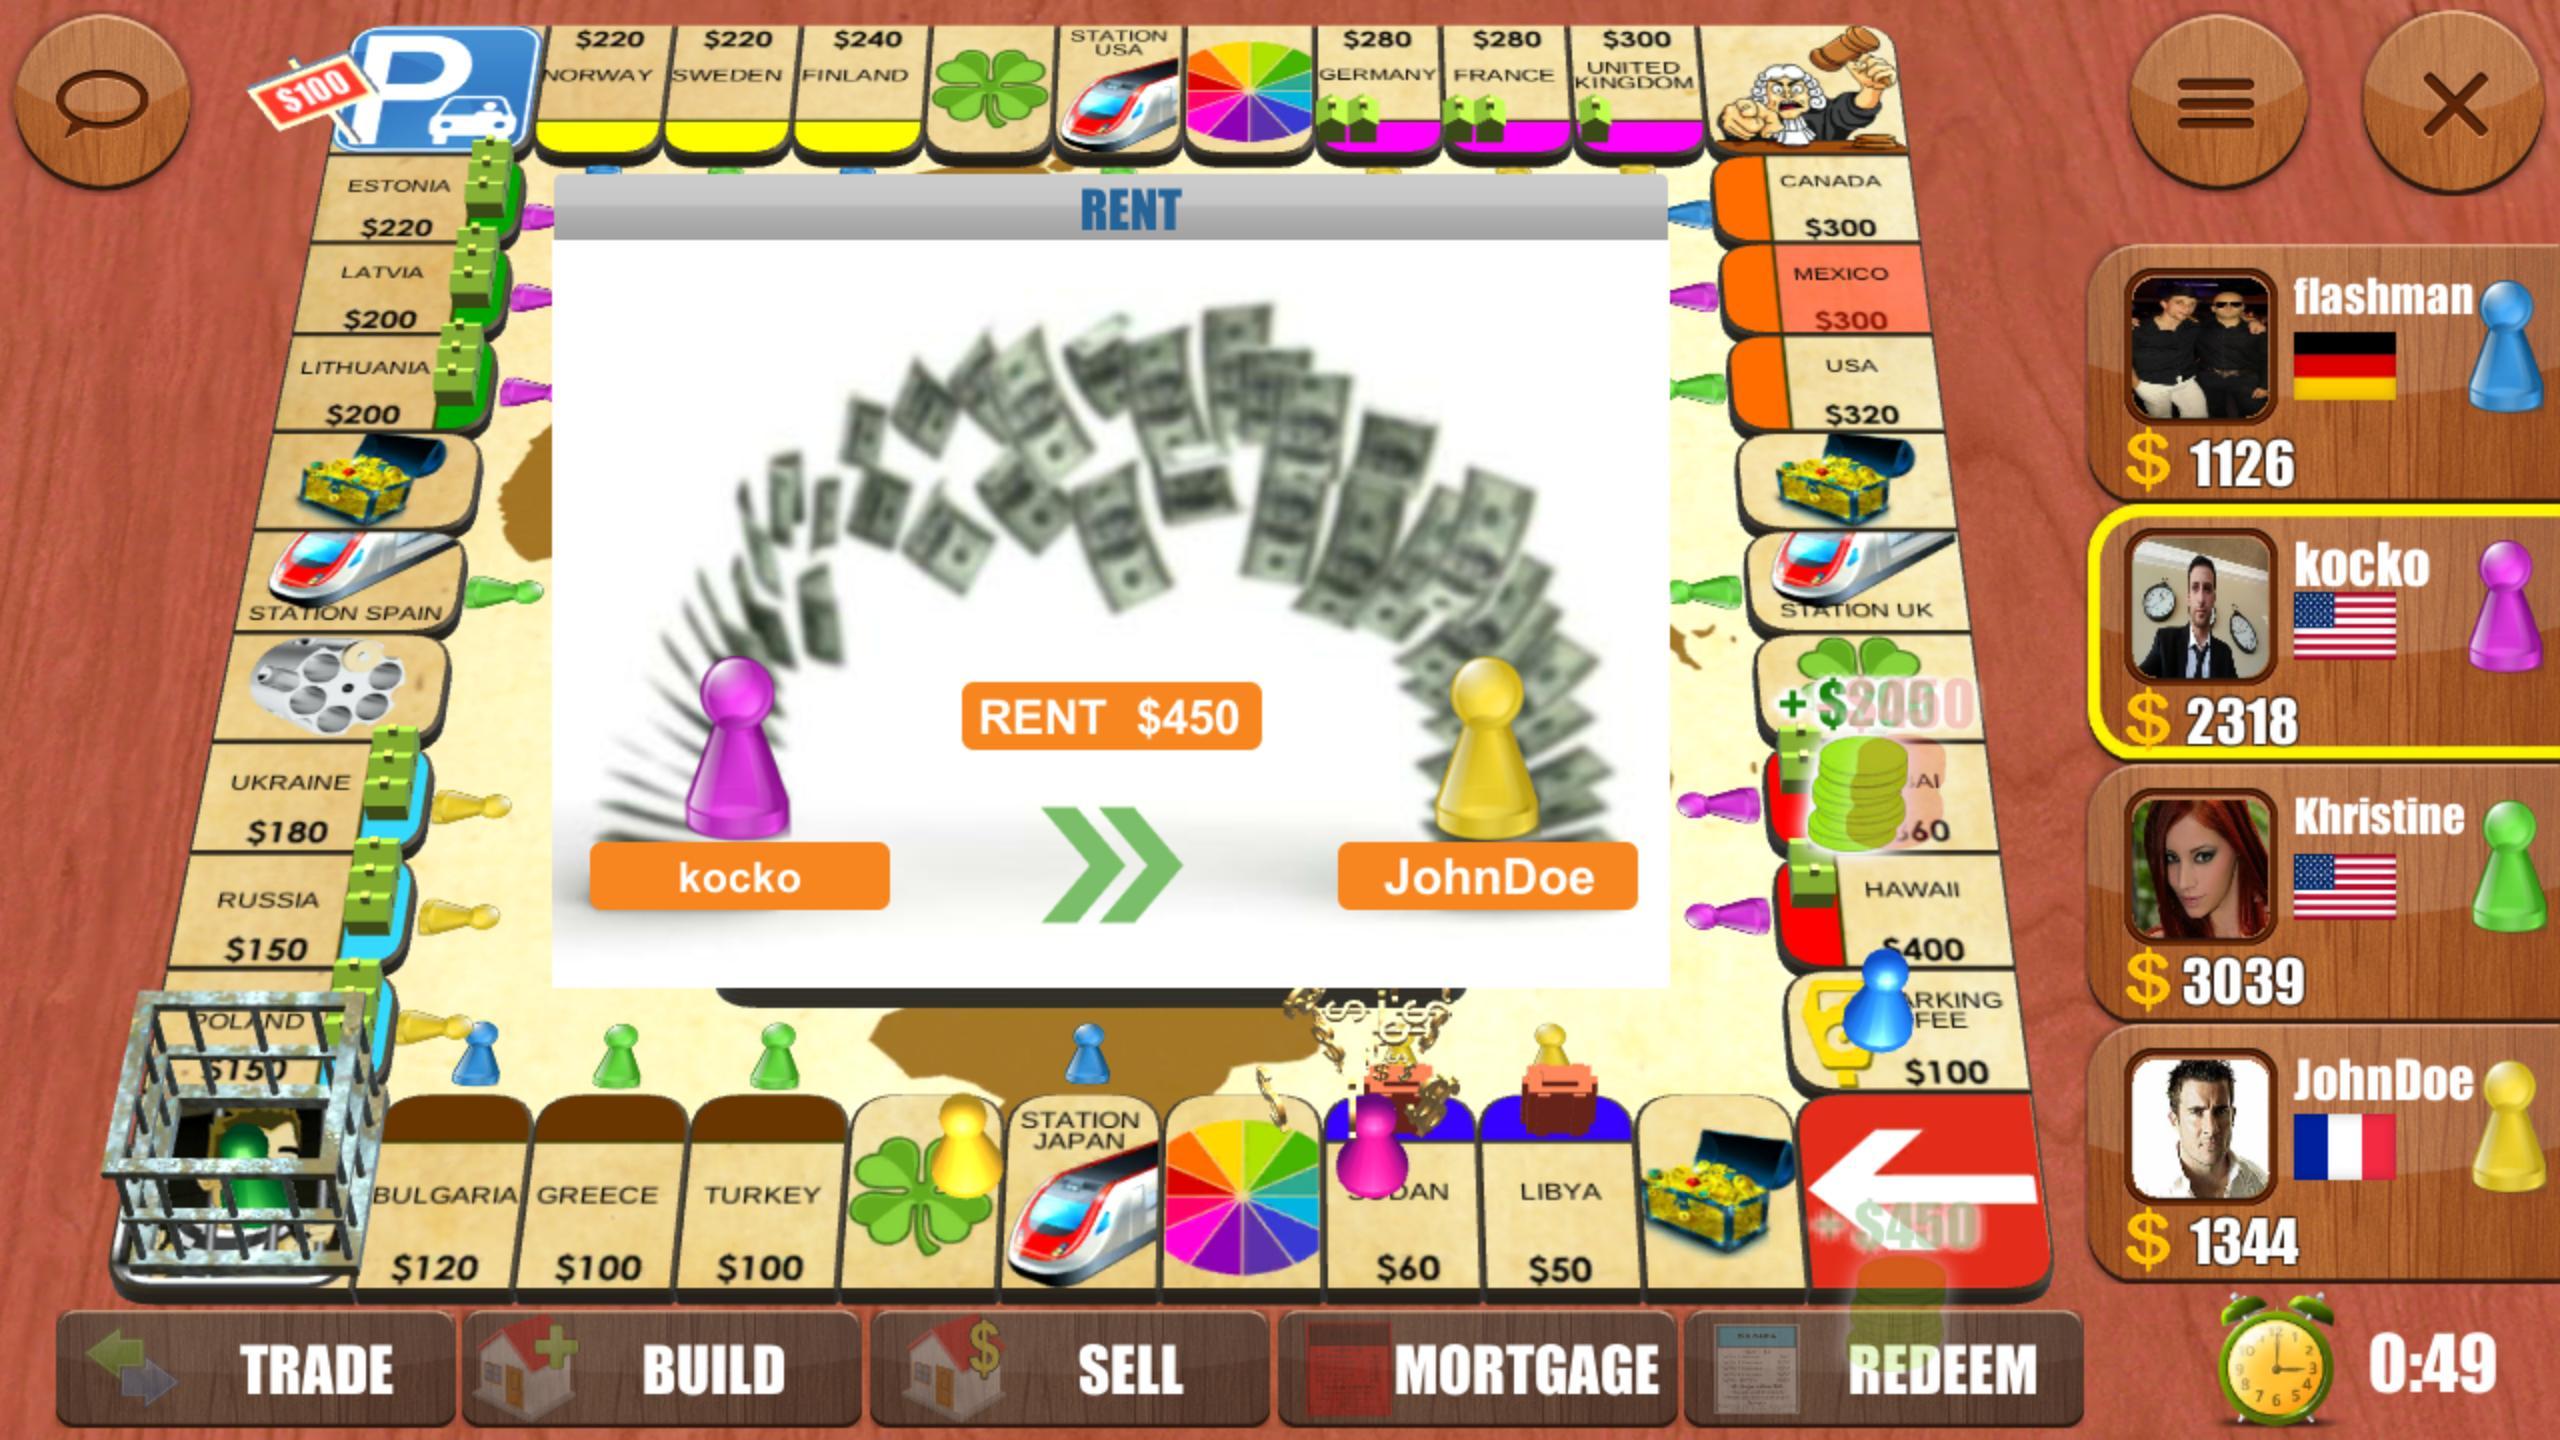 Rento Dice Board Game Online 5.1.9 Screenshot 10